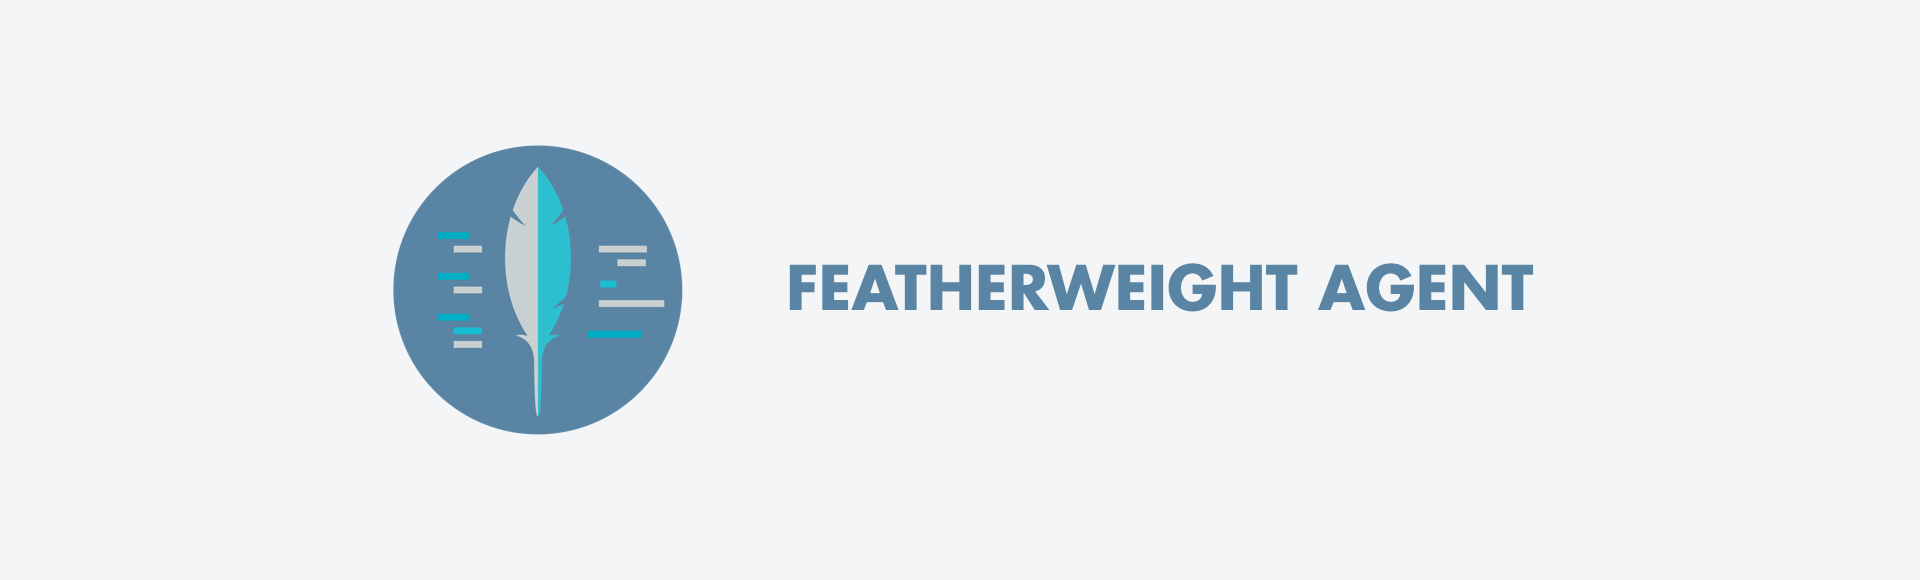 Skylight's Featherweight Agent